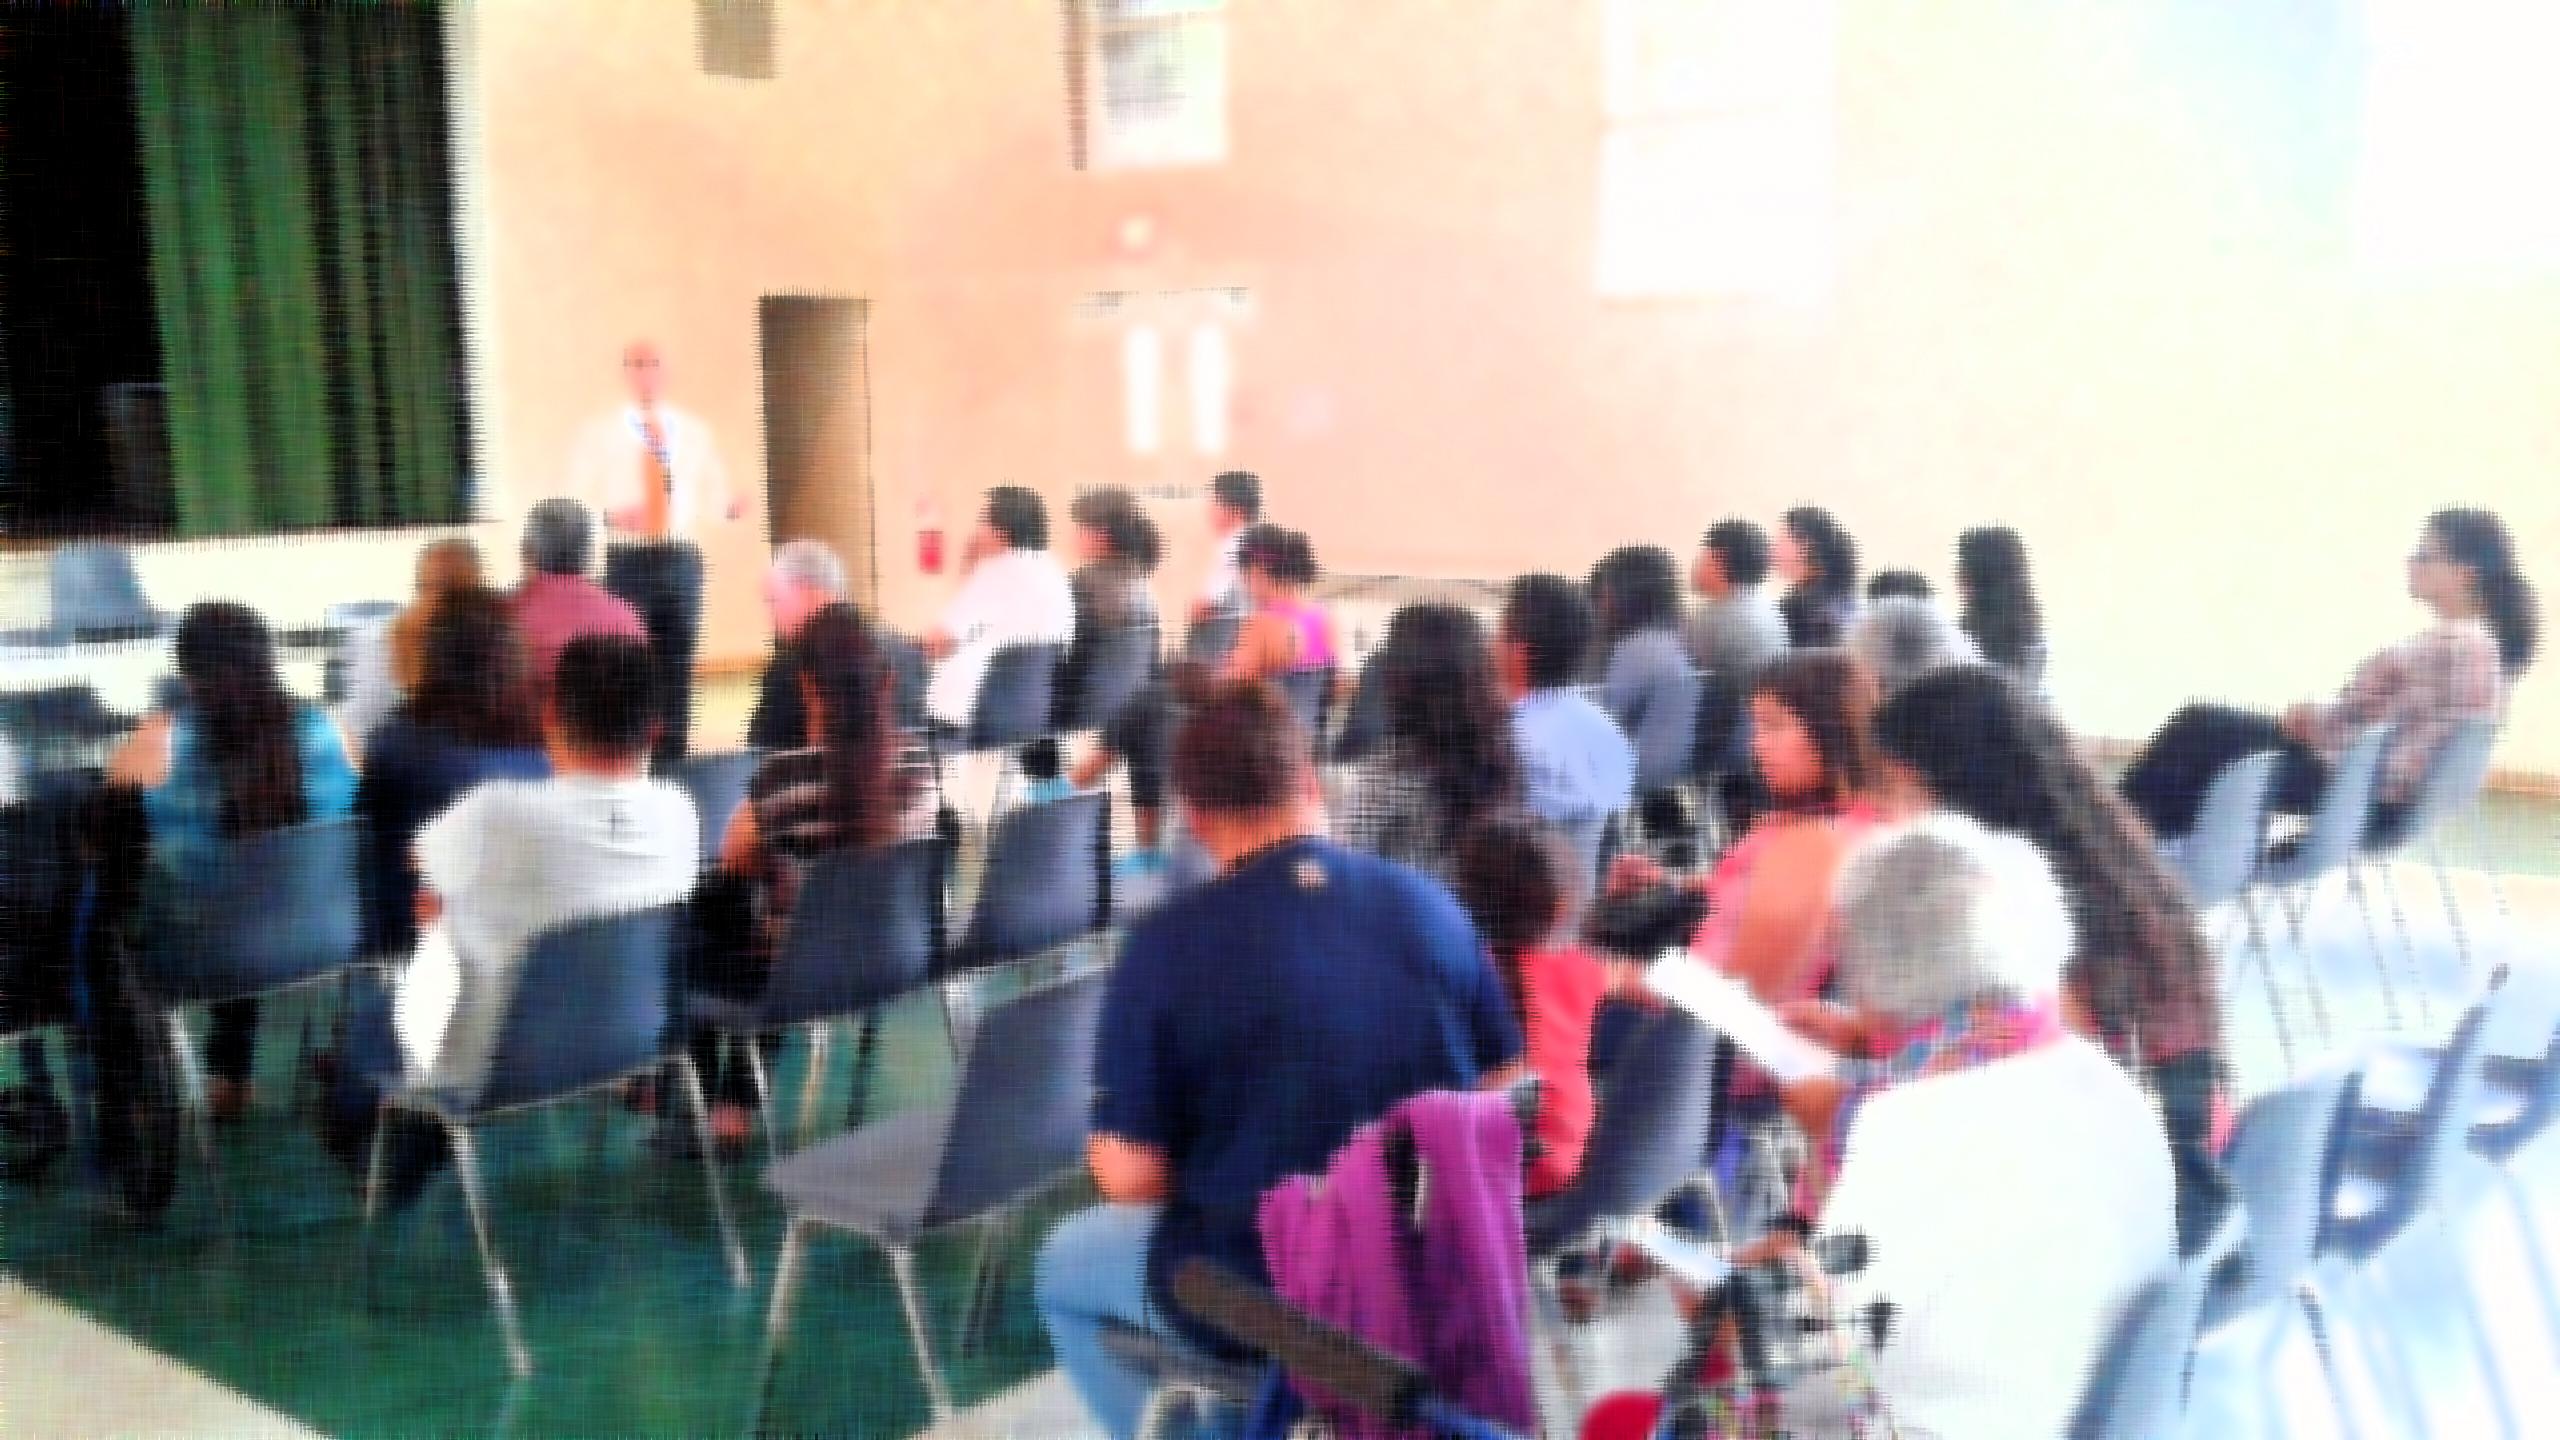 1610_-_GCLCG_-_DACA_Workshop_at_All_Saints_Catholic-_Blurred.jpg